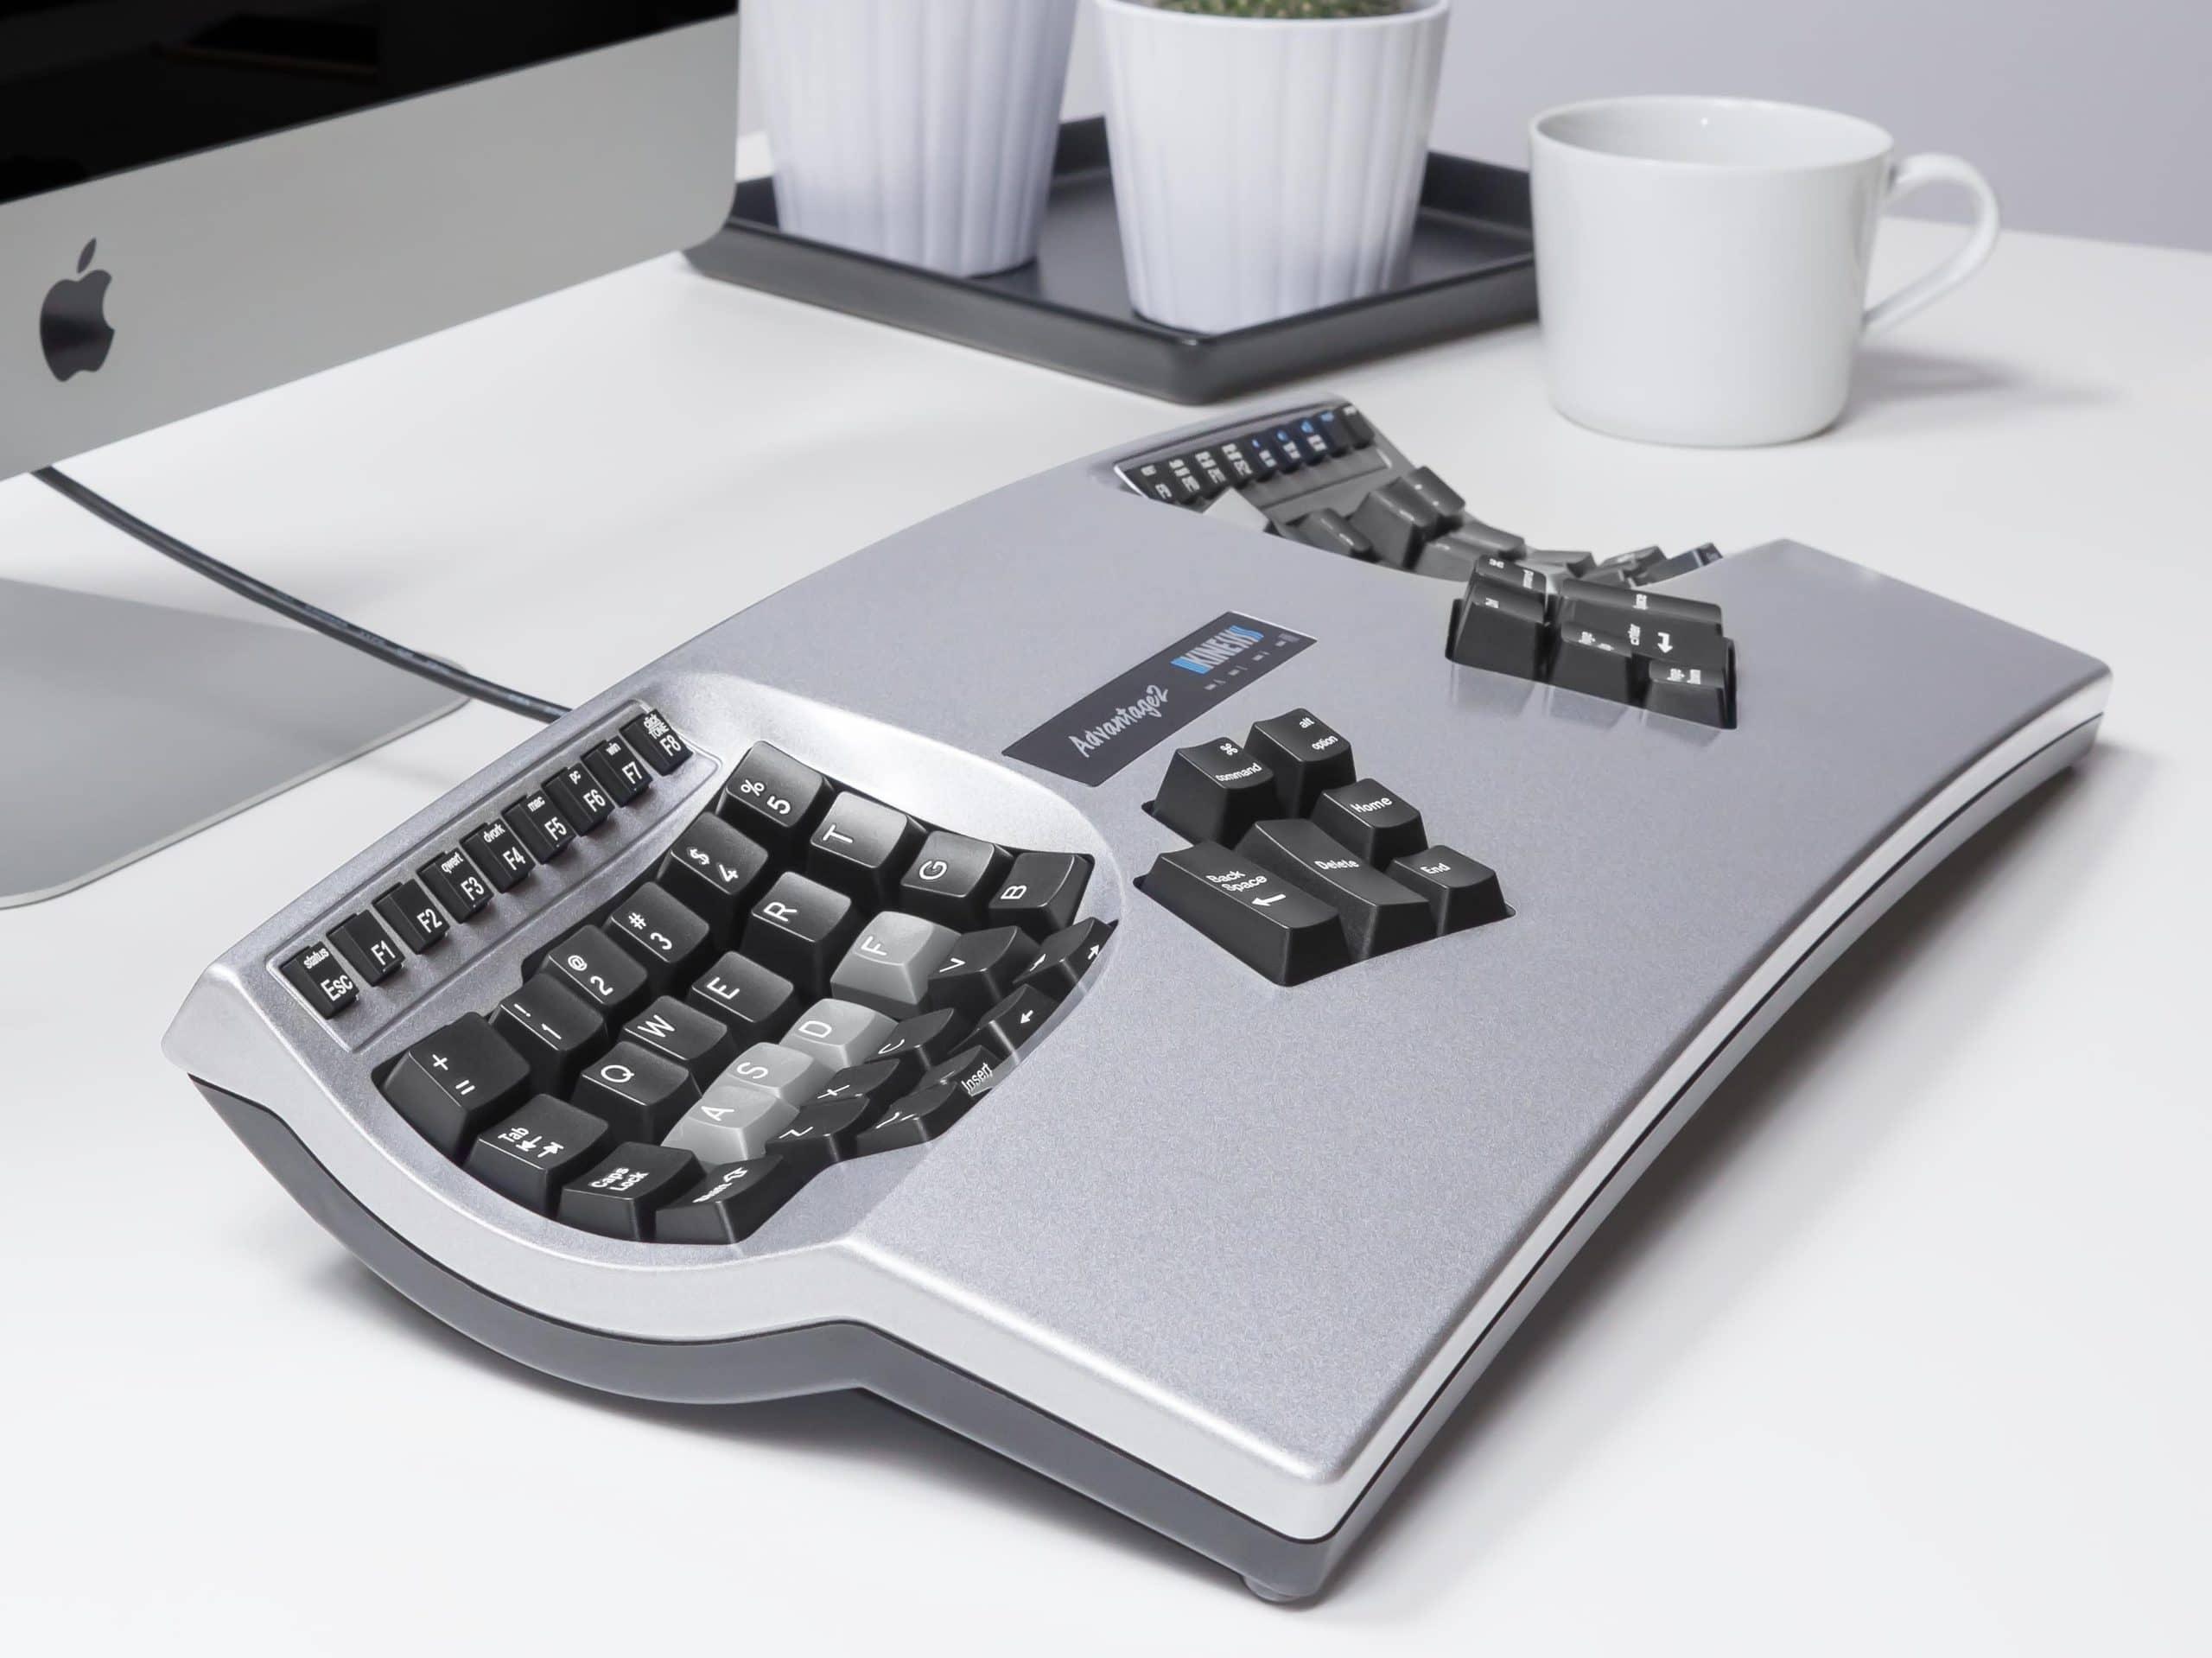 самая эргономичная клавиатура kinesis advantage 2